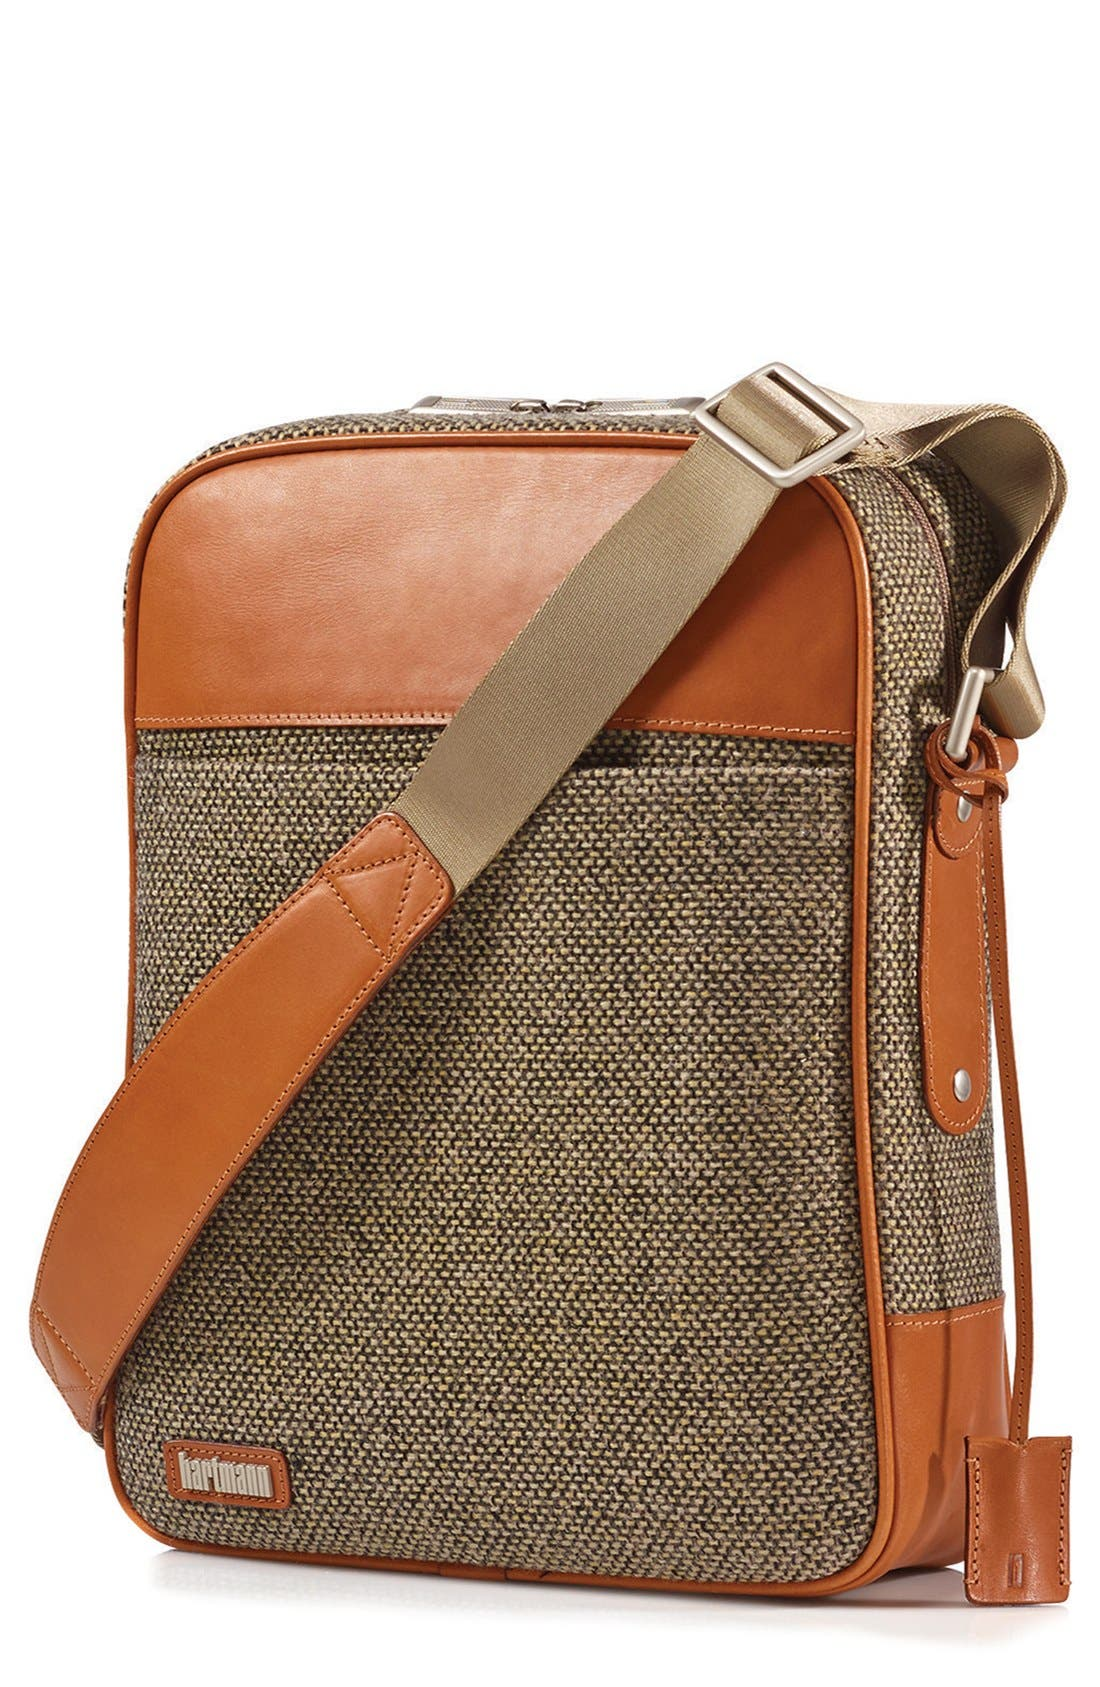 'Tweed Belting' Crossbody Bag,                             Main thumbnail 1, color,                             217